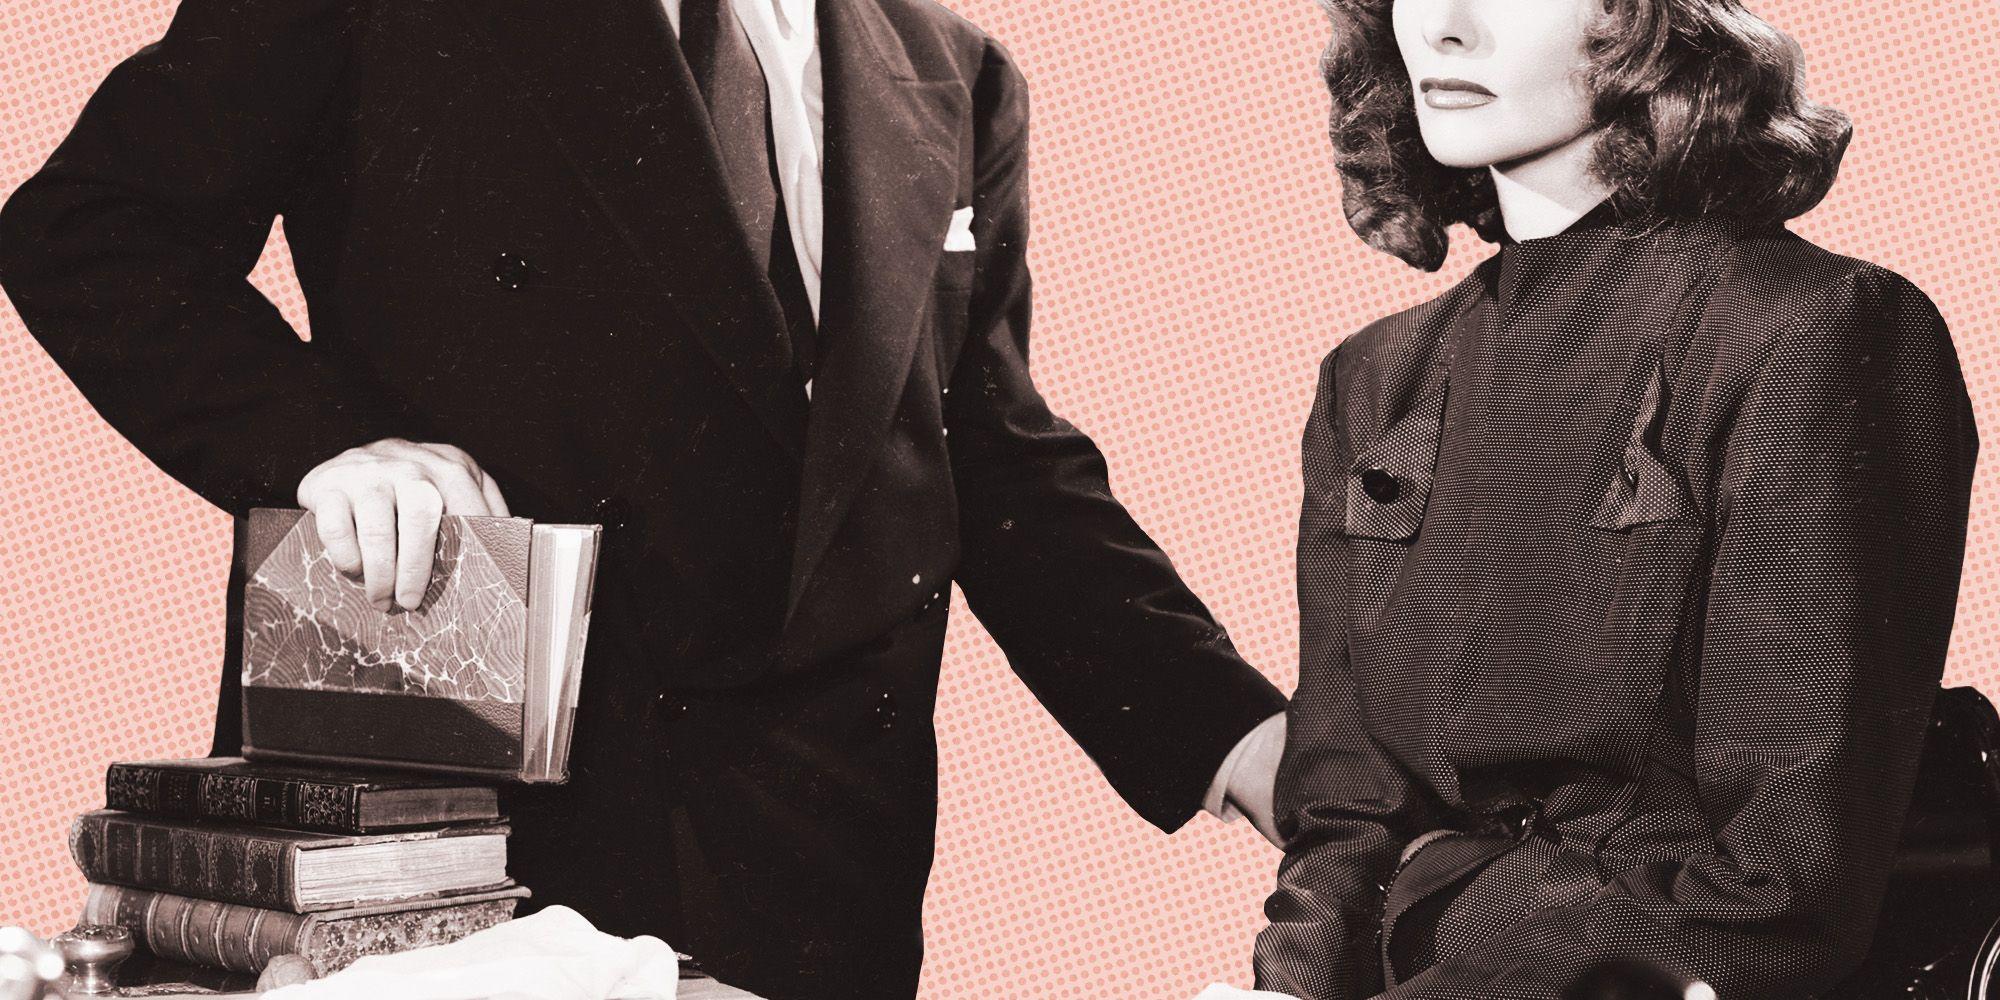 Interoffice dating